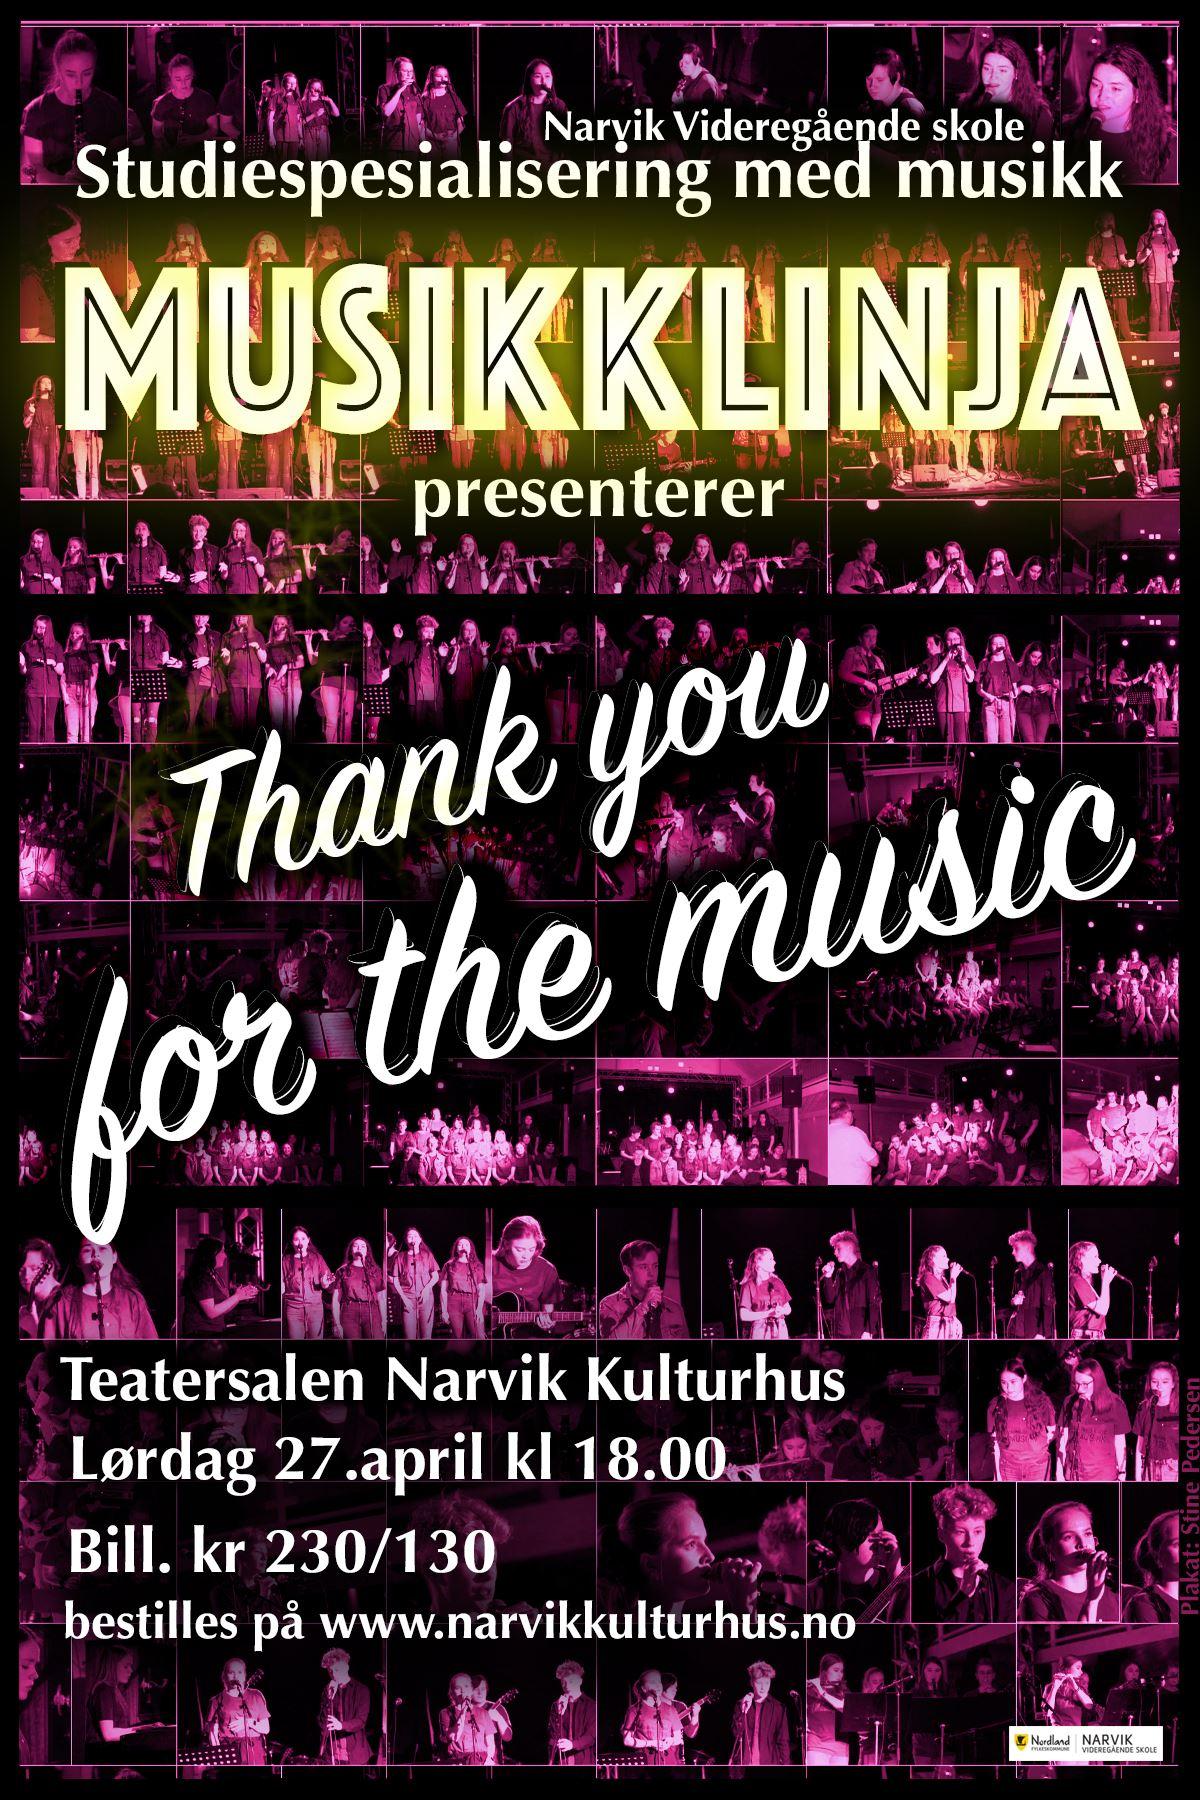 © Nordland fylkeskommune, Narvik VGS, Thank You for the Music